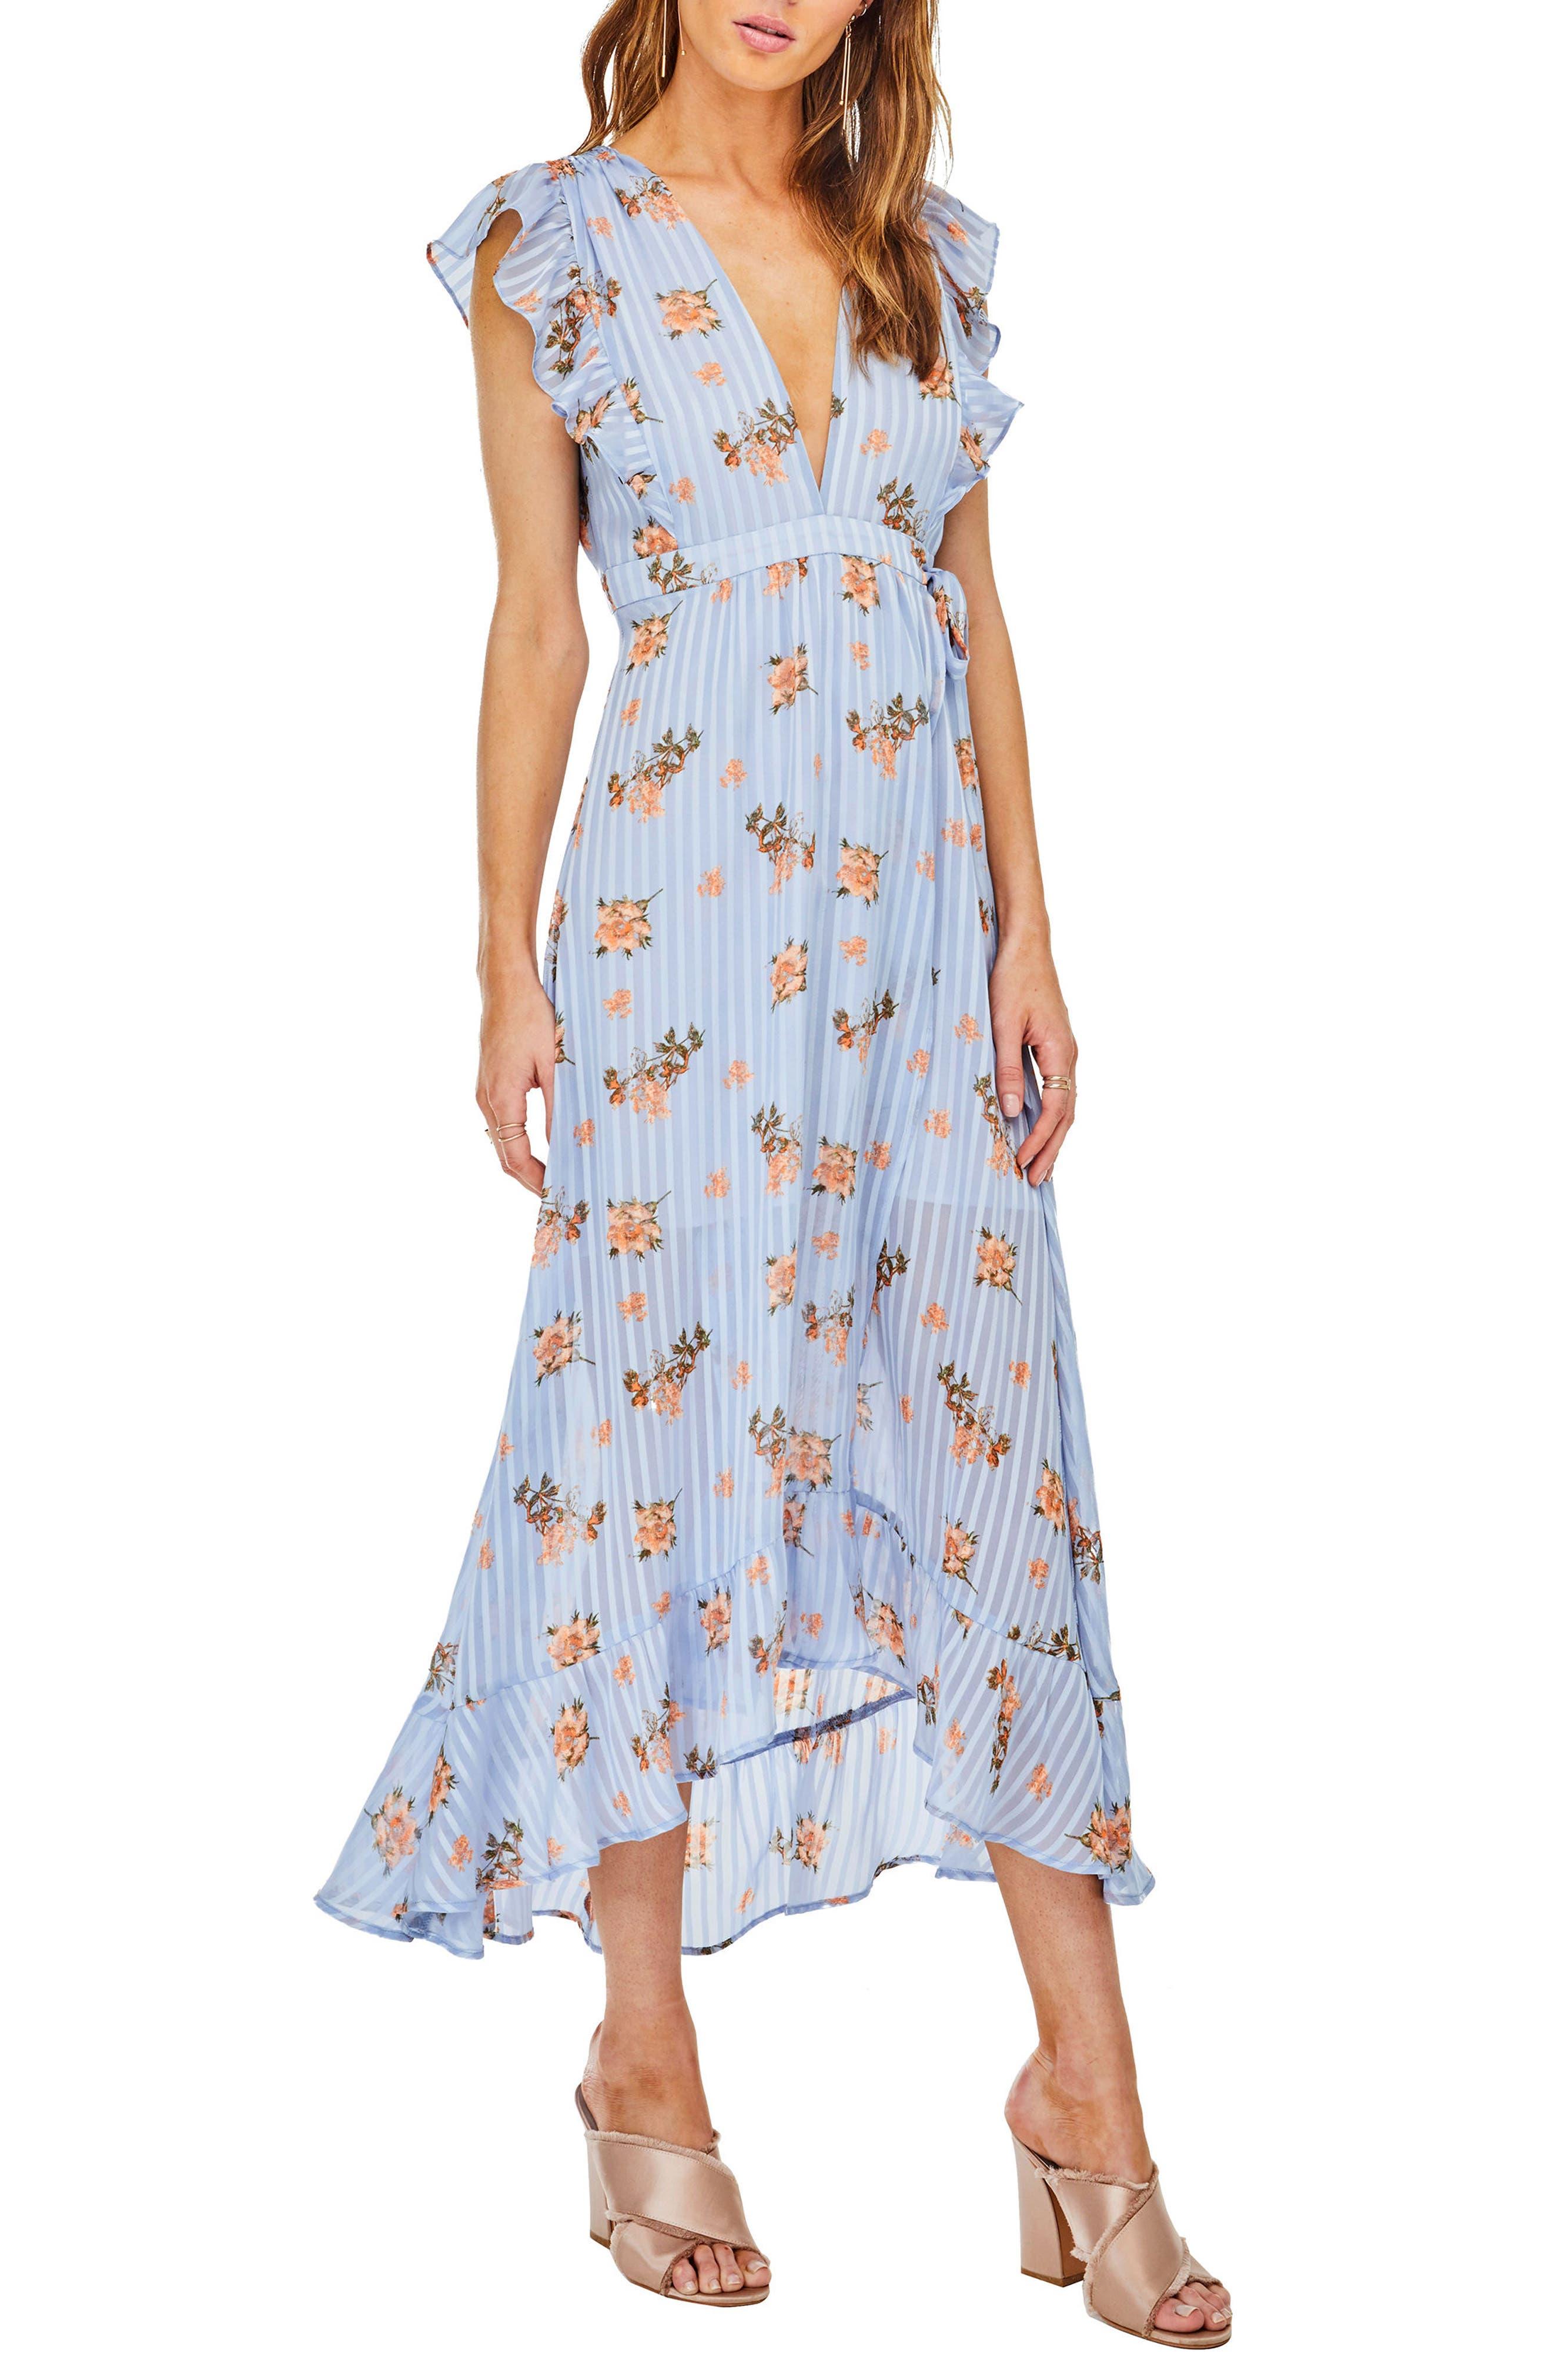 Lila Midi Dress,                         Main,                         color, Blue/Peach Floral